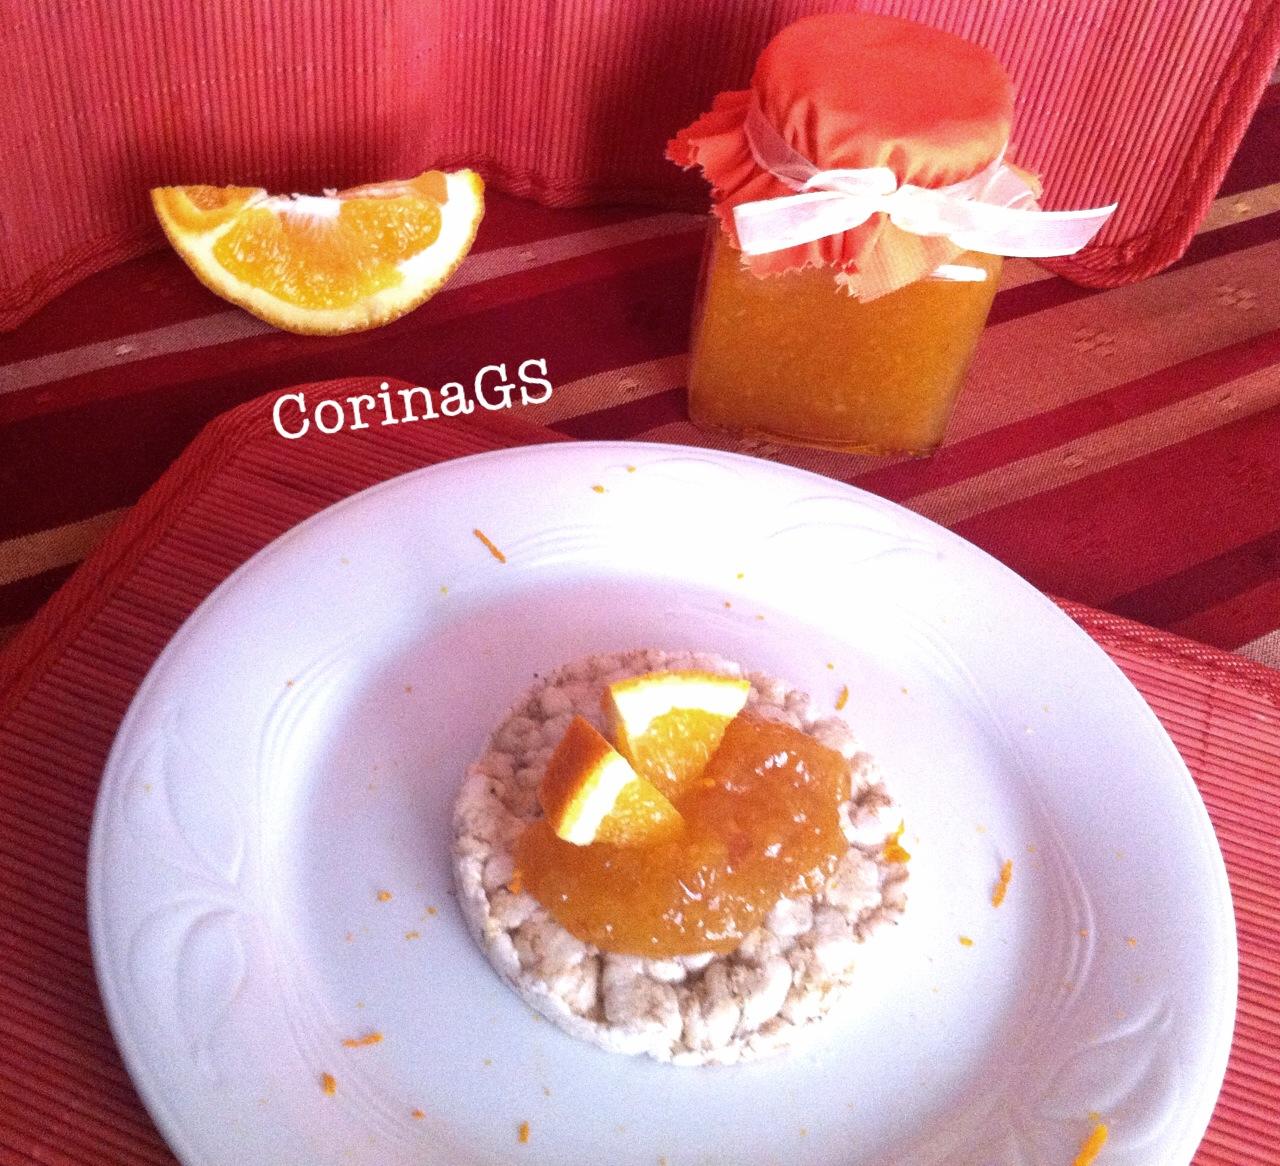 Marmellata di arance Ricetta base arance CorinaGS